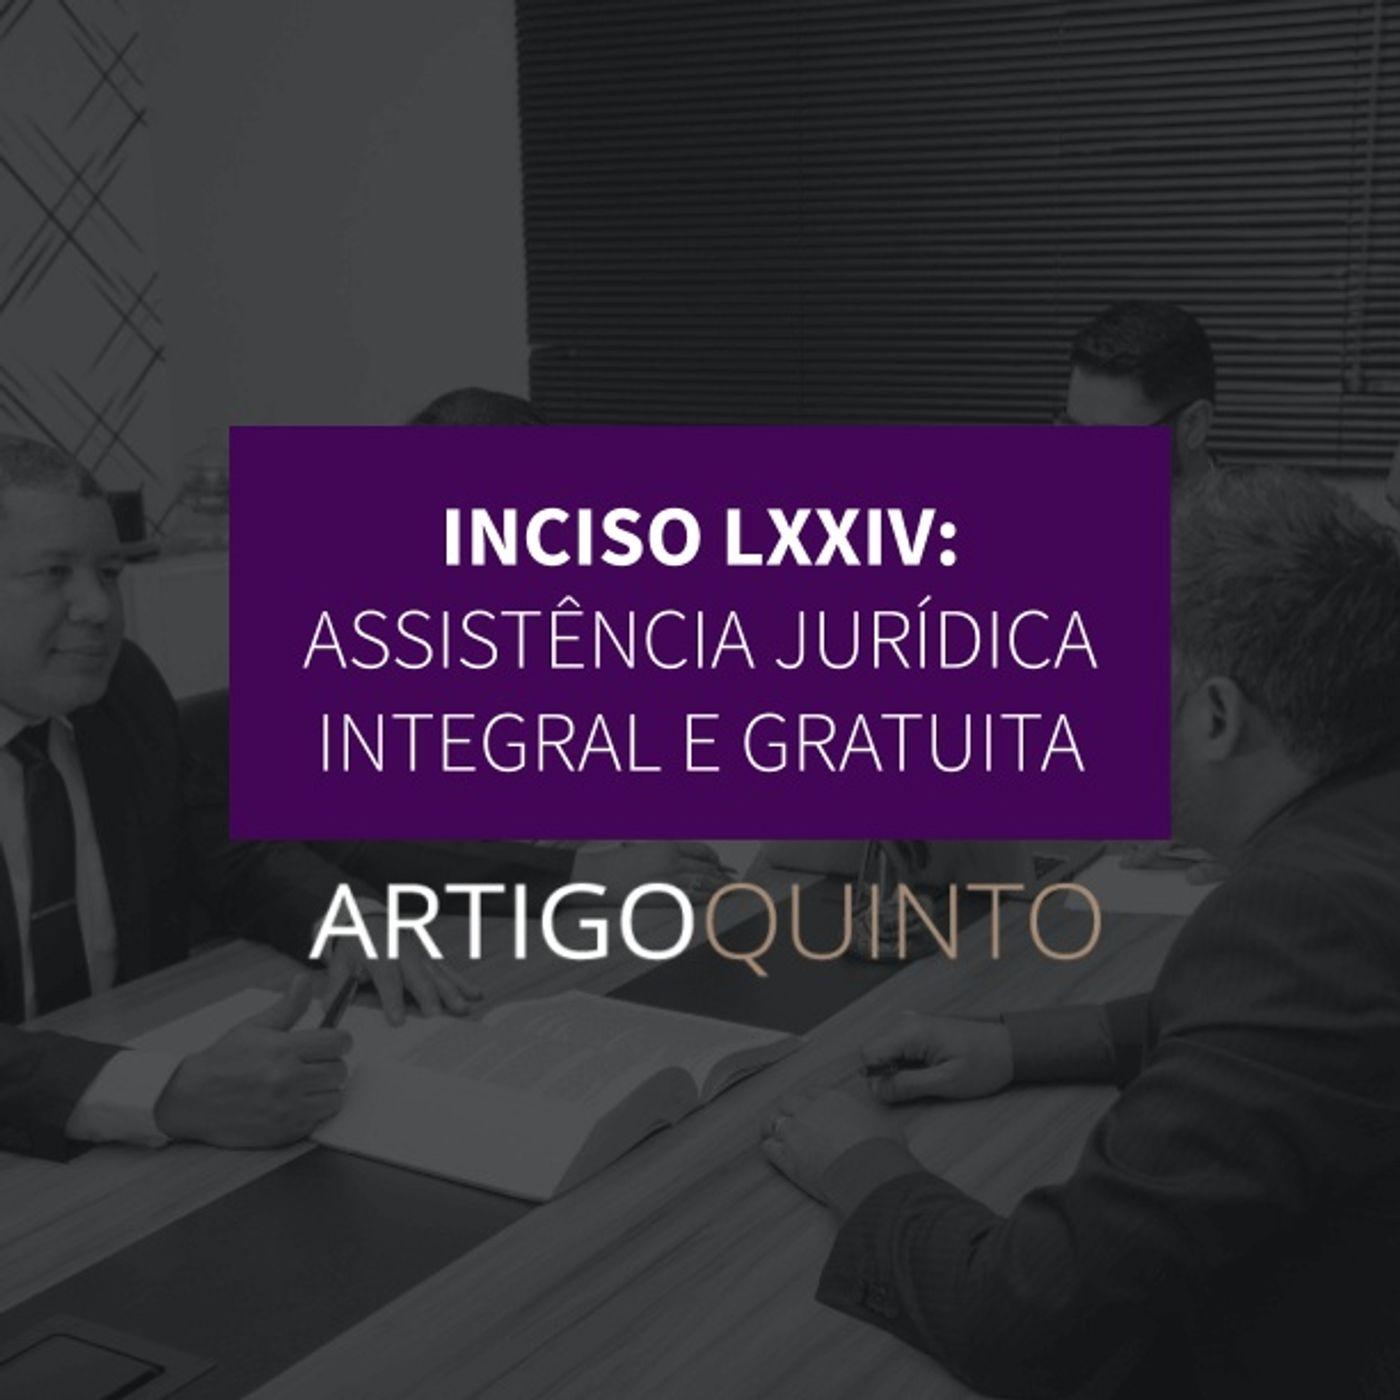 Inciso LXXIV - Assistência jurídica integral e gratuita